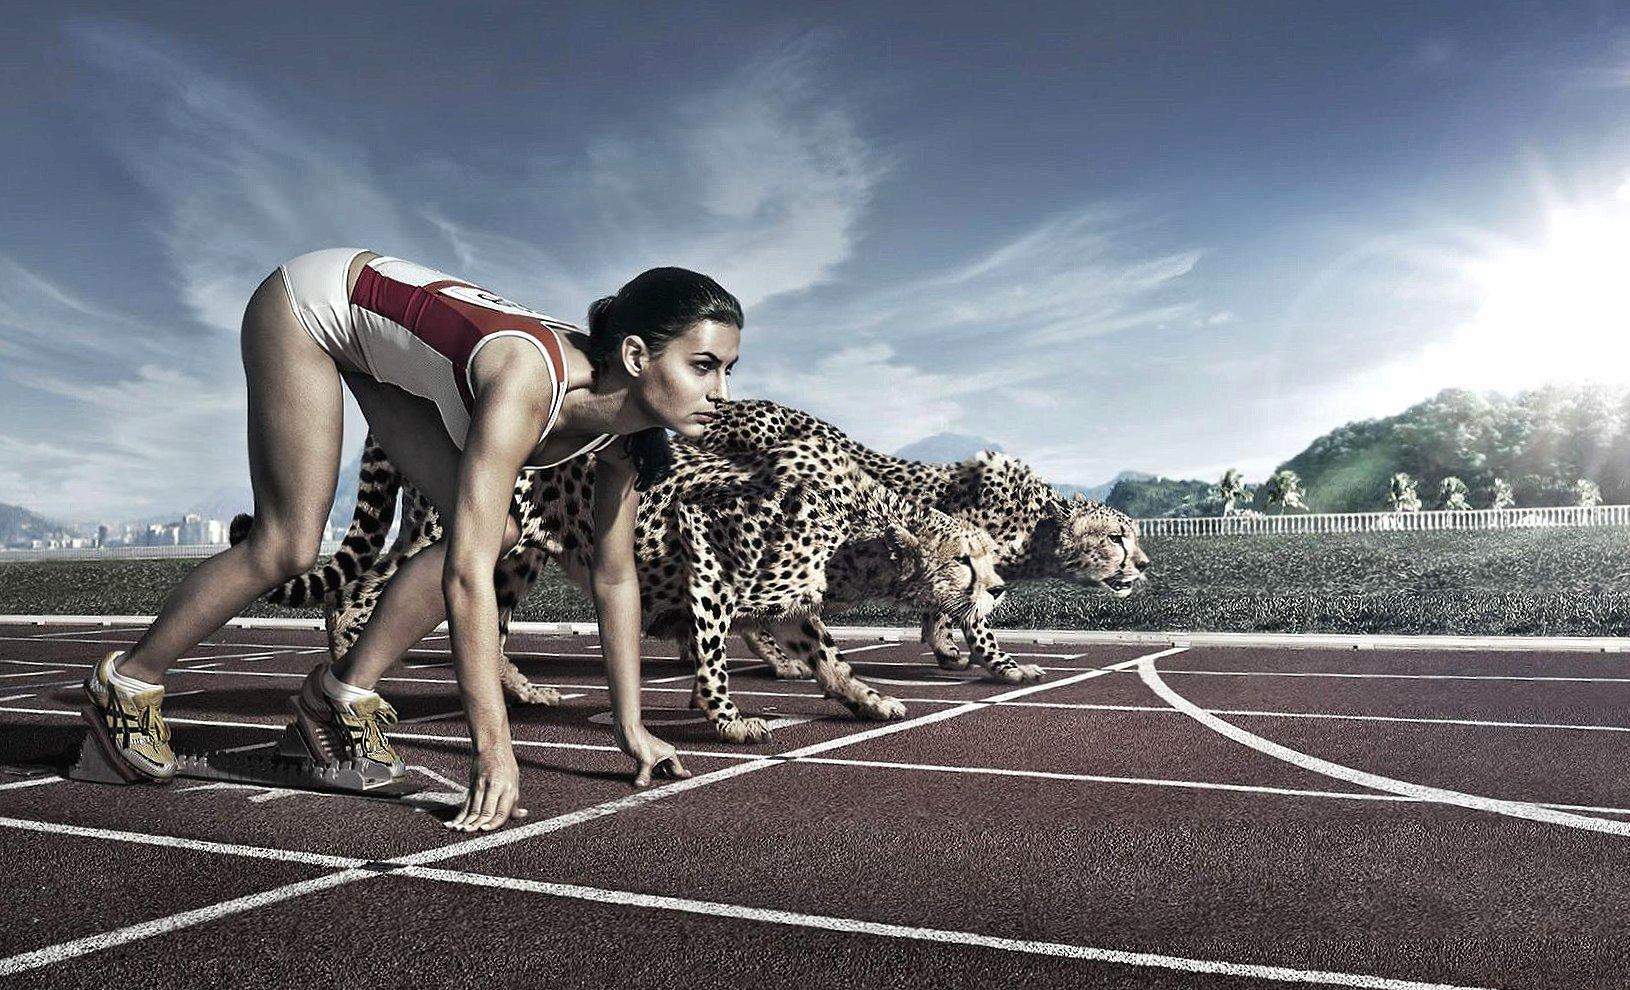 Cheetahs vs woman digital art wallpapers HD quality